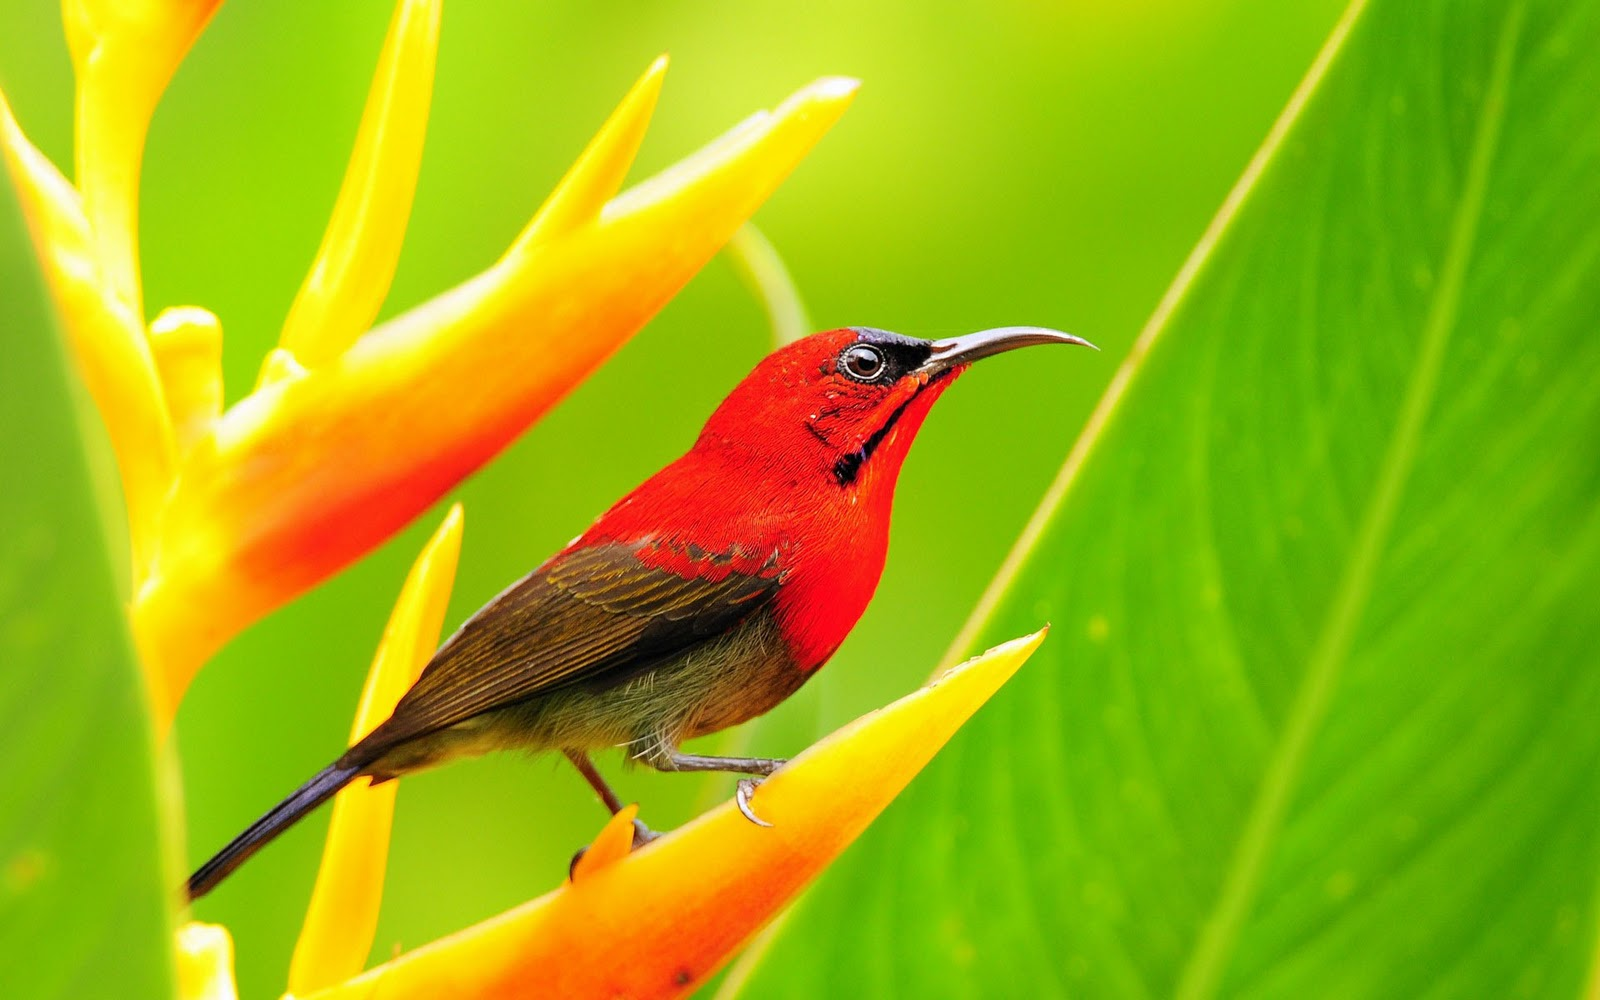 Bird wallpaper birds wallpaper desktop wallpaper tweety bird